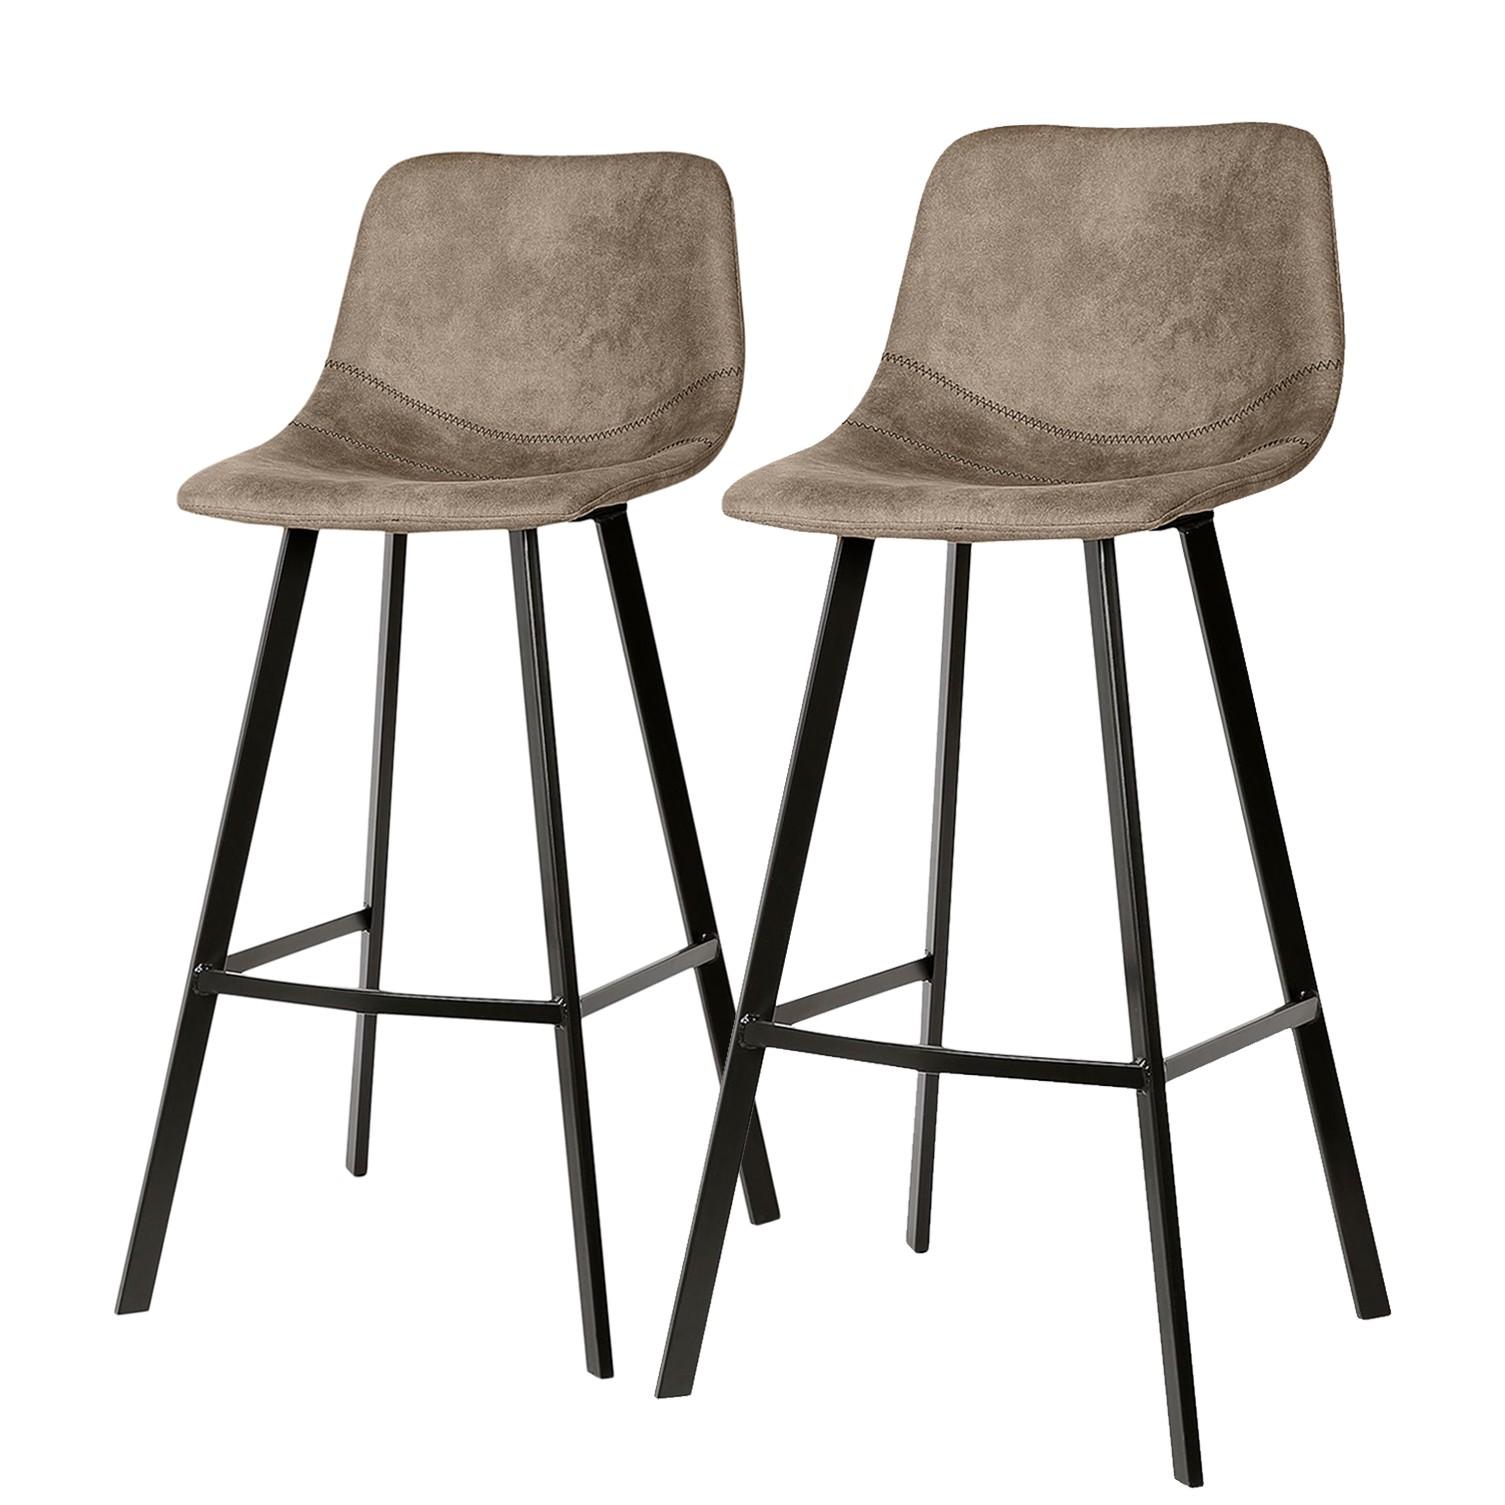 home24 Barstuhl Luhi (2er-Set) | Küche und Esszimmer > Bar-Möbel | ars manufacti